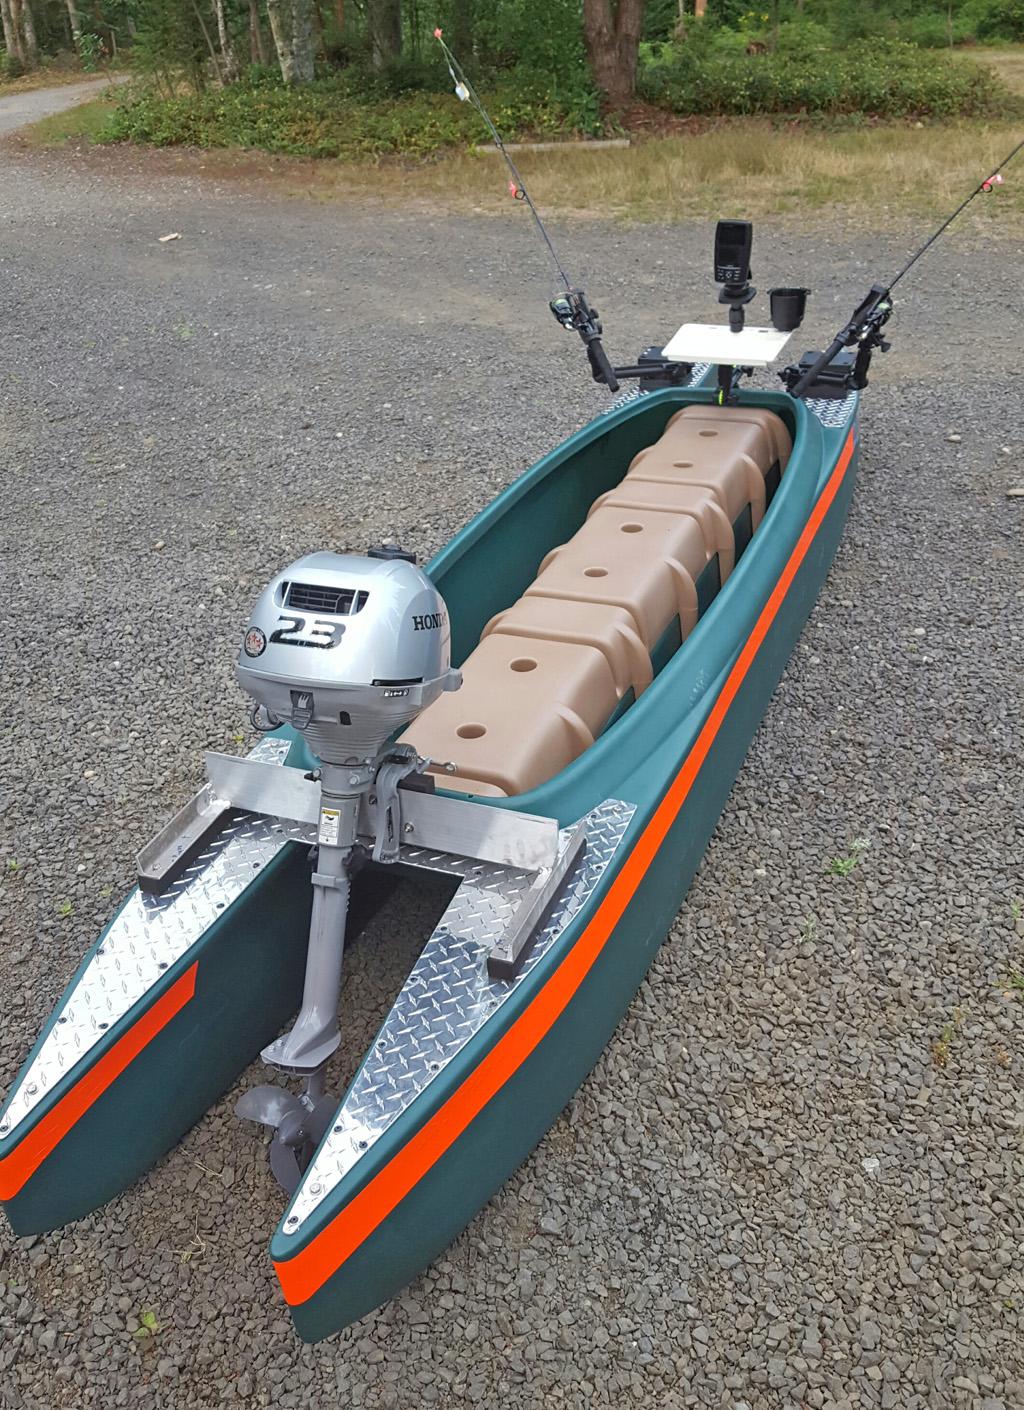 Wavewalk-700-with-2.3HP-Honda-outboard-motor-1024 (3)